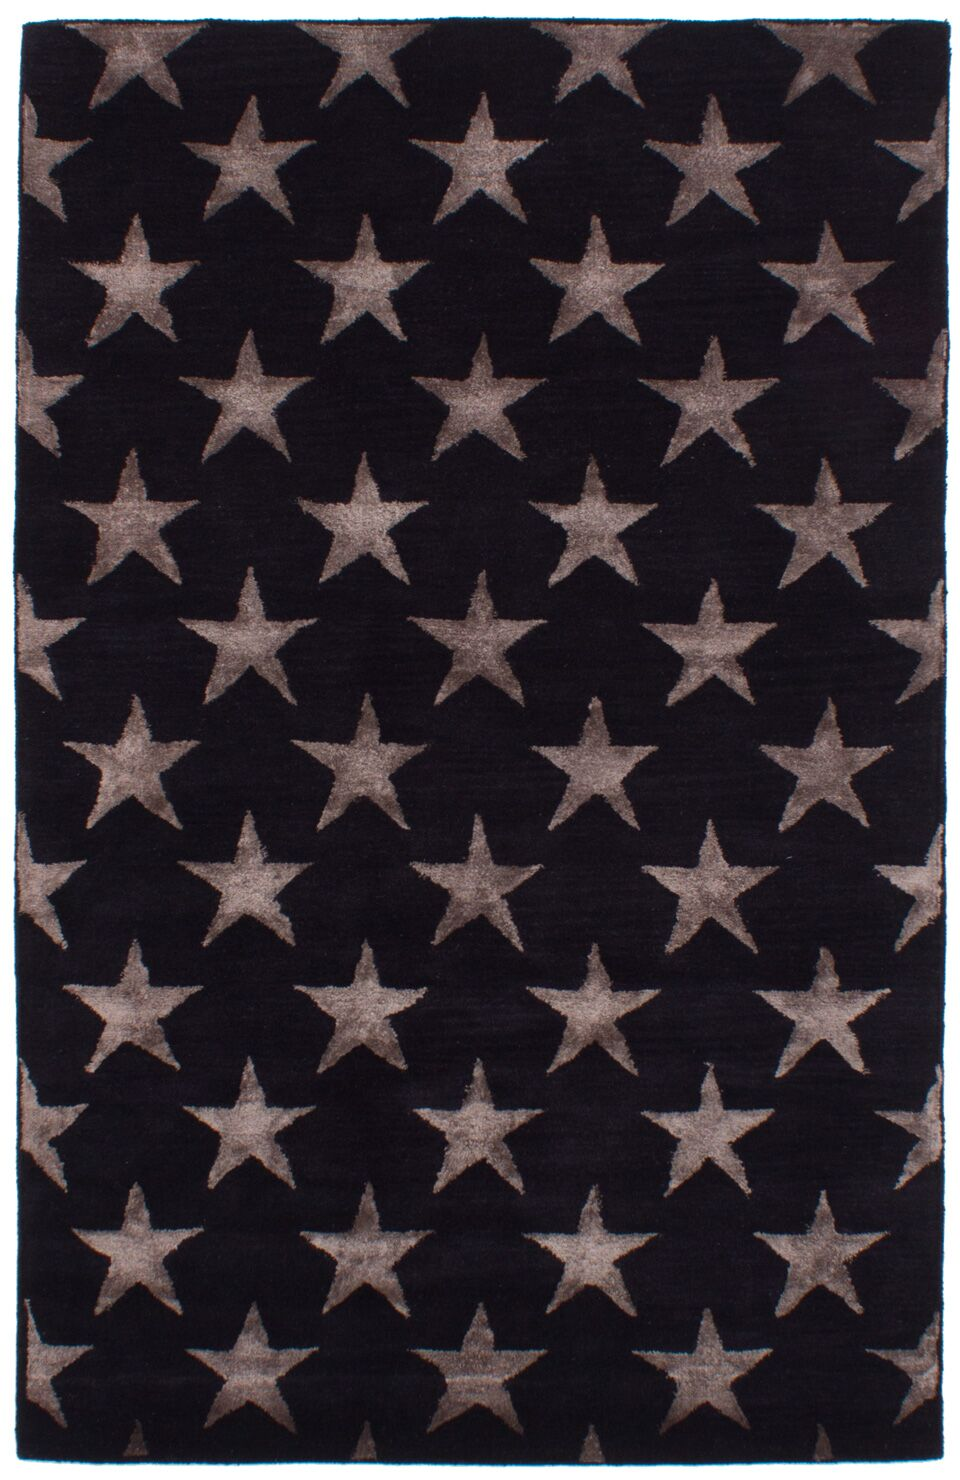 Dimas Abstract Art Hand-Tufted Wool/Silk Black Area Rug